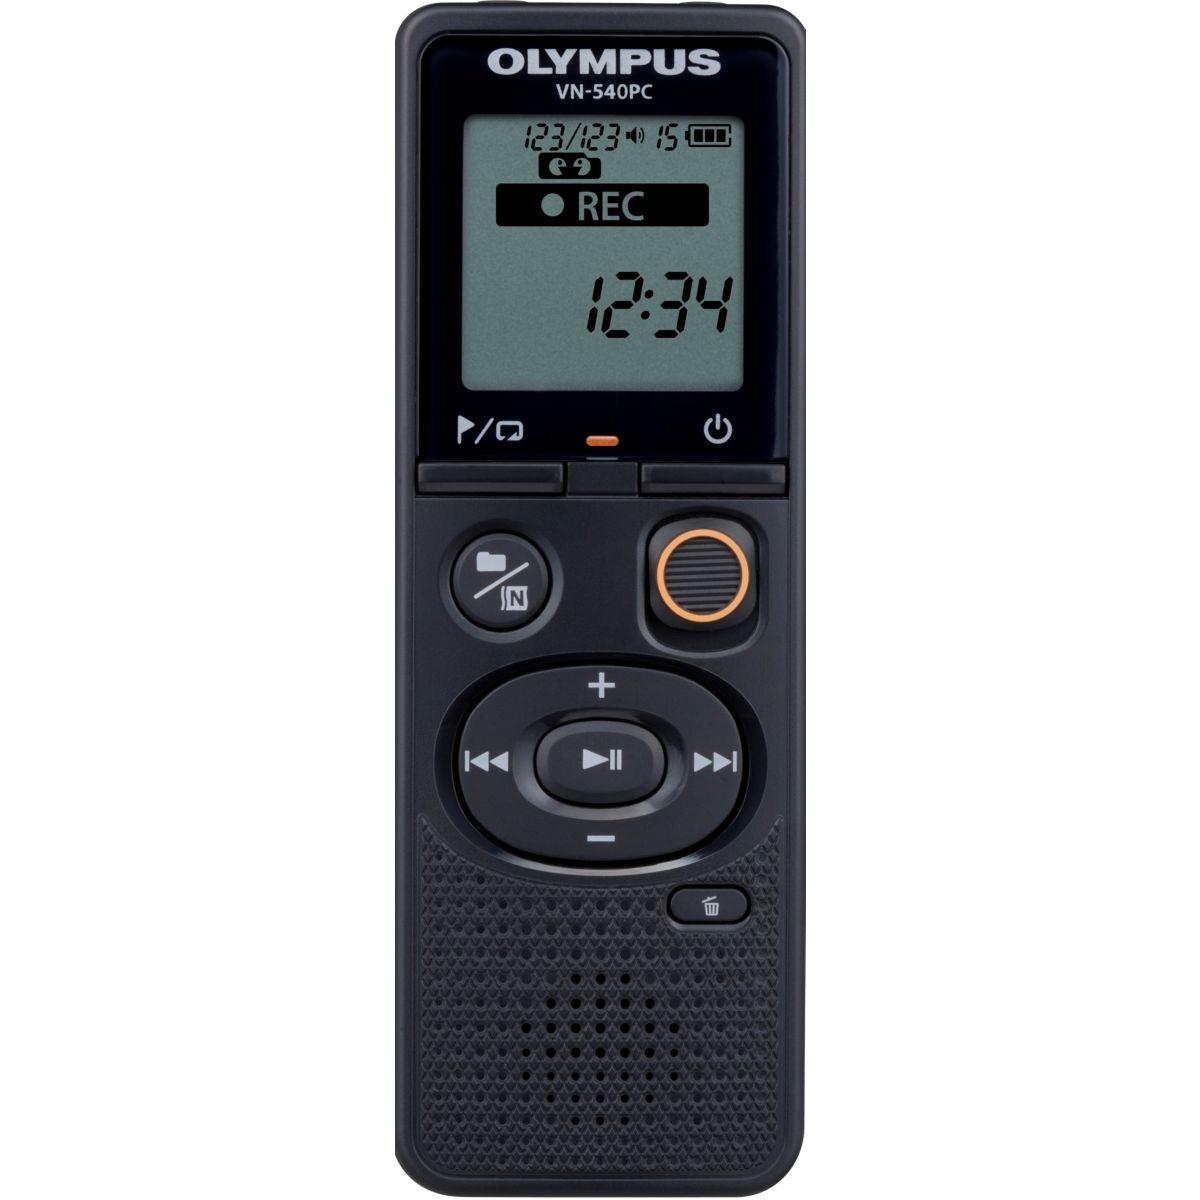 Dictaphone OLYMPUS VN-540 (photo)